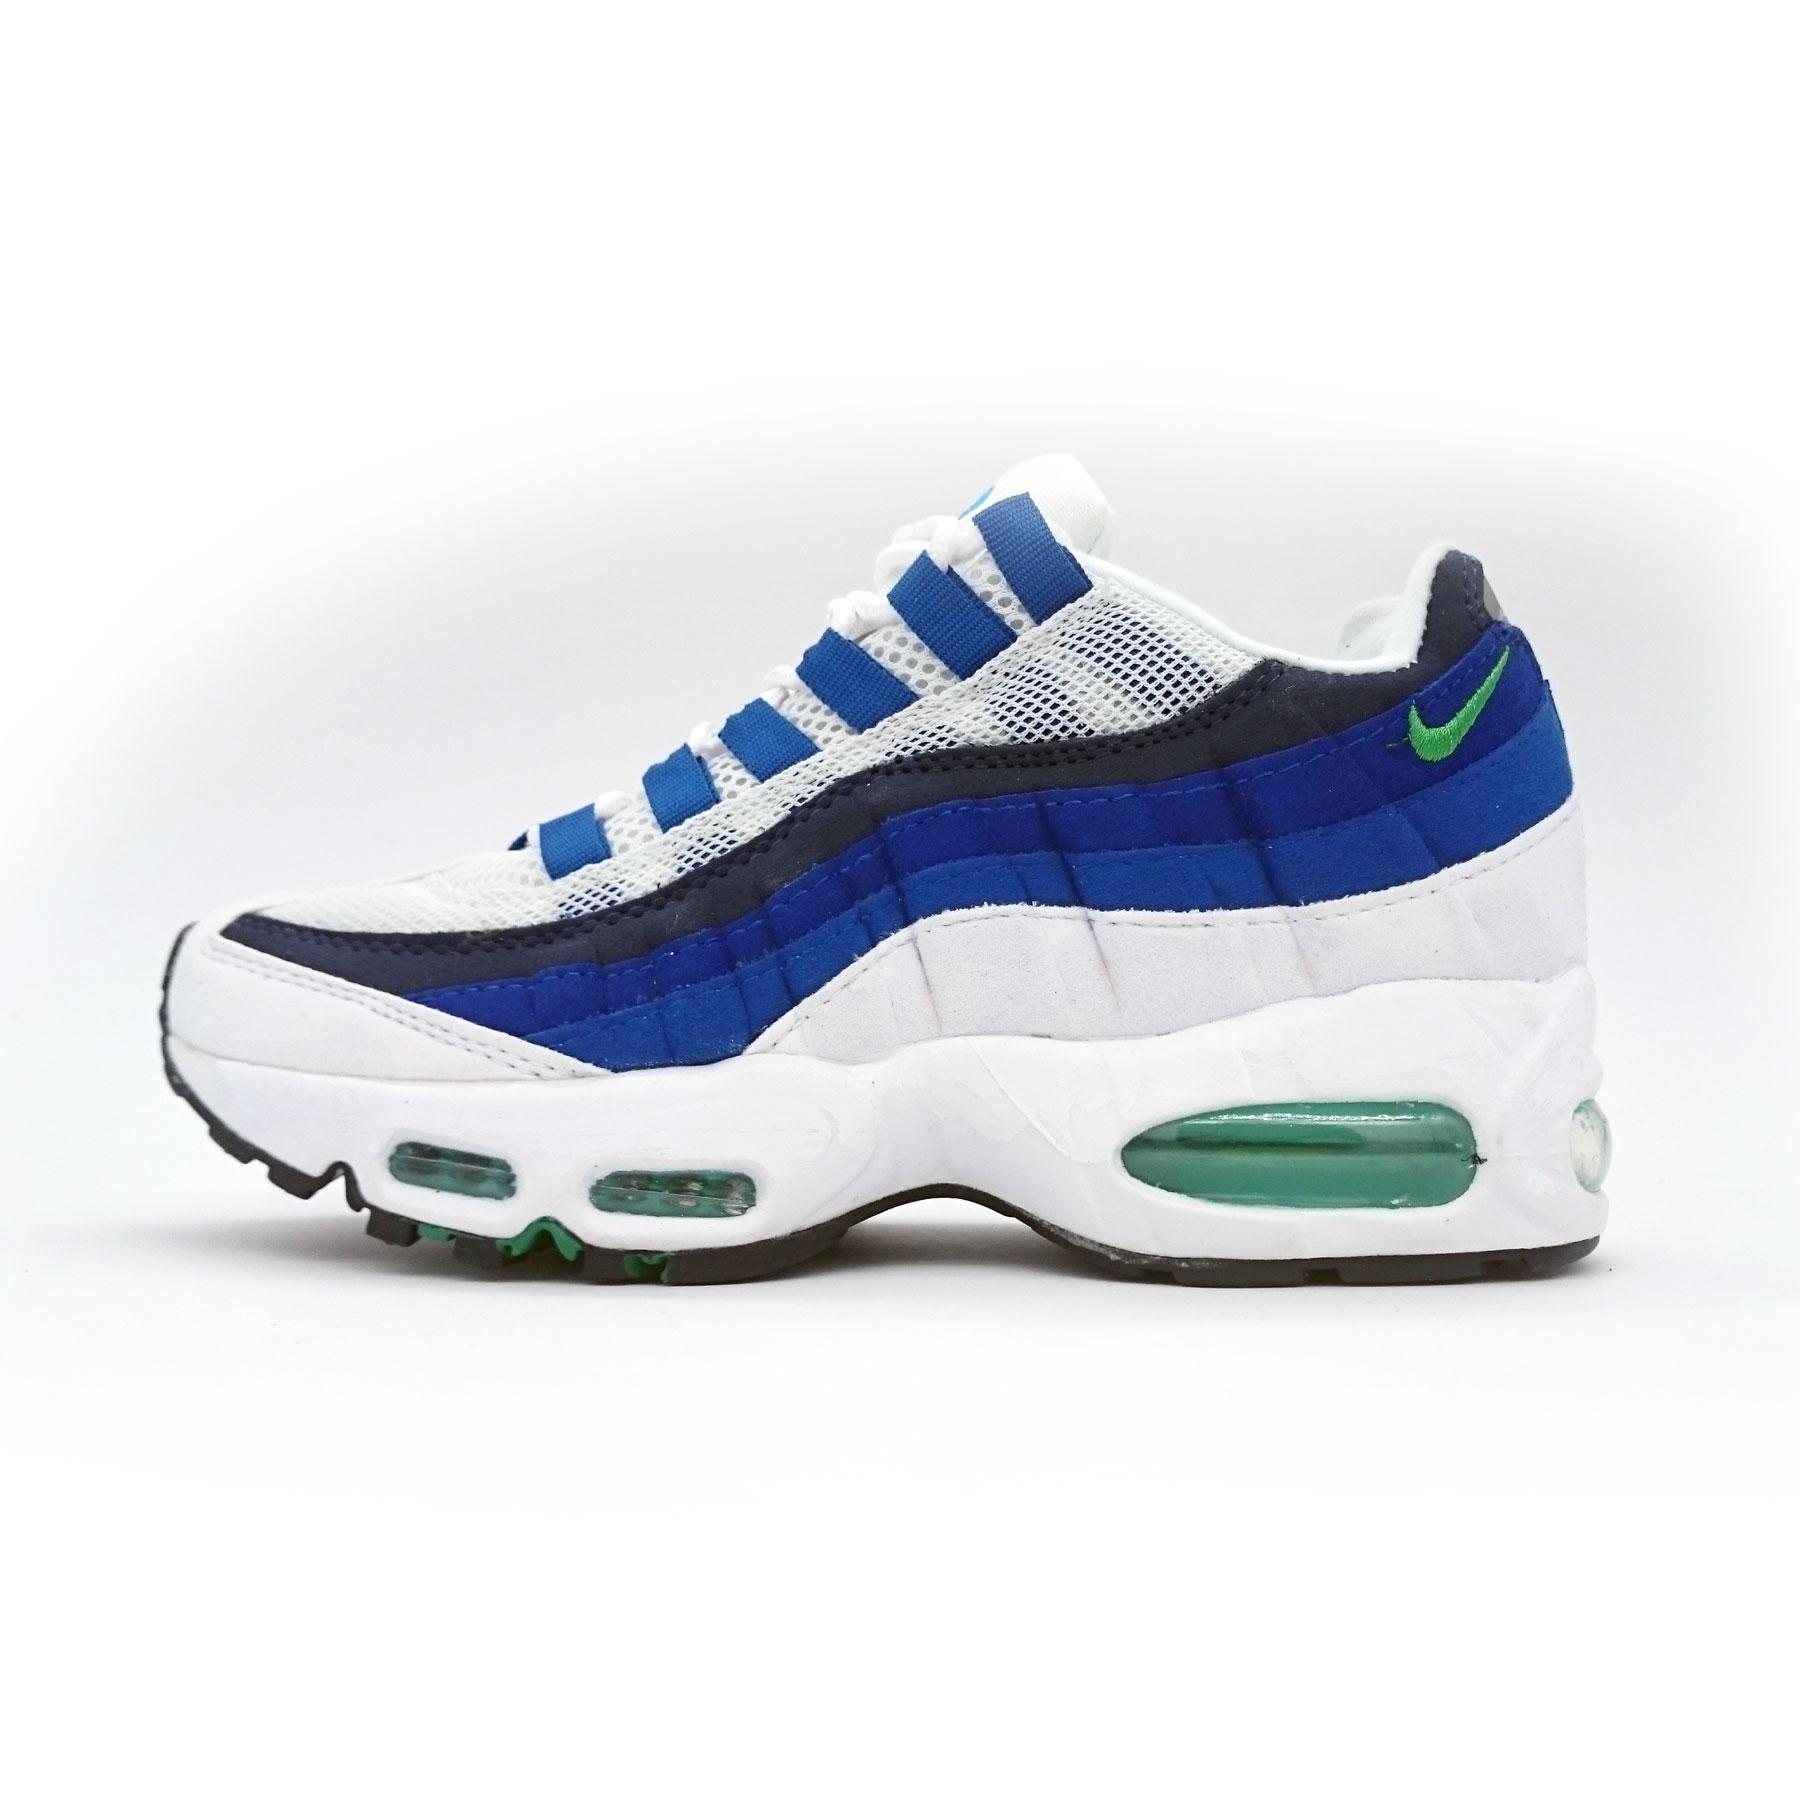 dda9b3a4 Женские кроссовки Nike air max 95 , купить Бело Синие аир макс 95 в ...